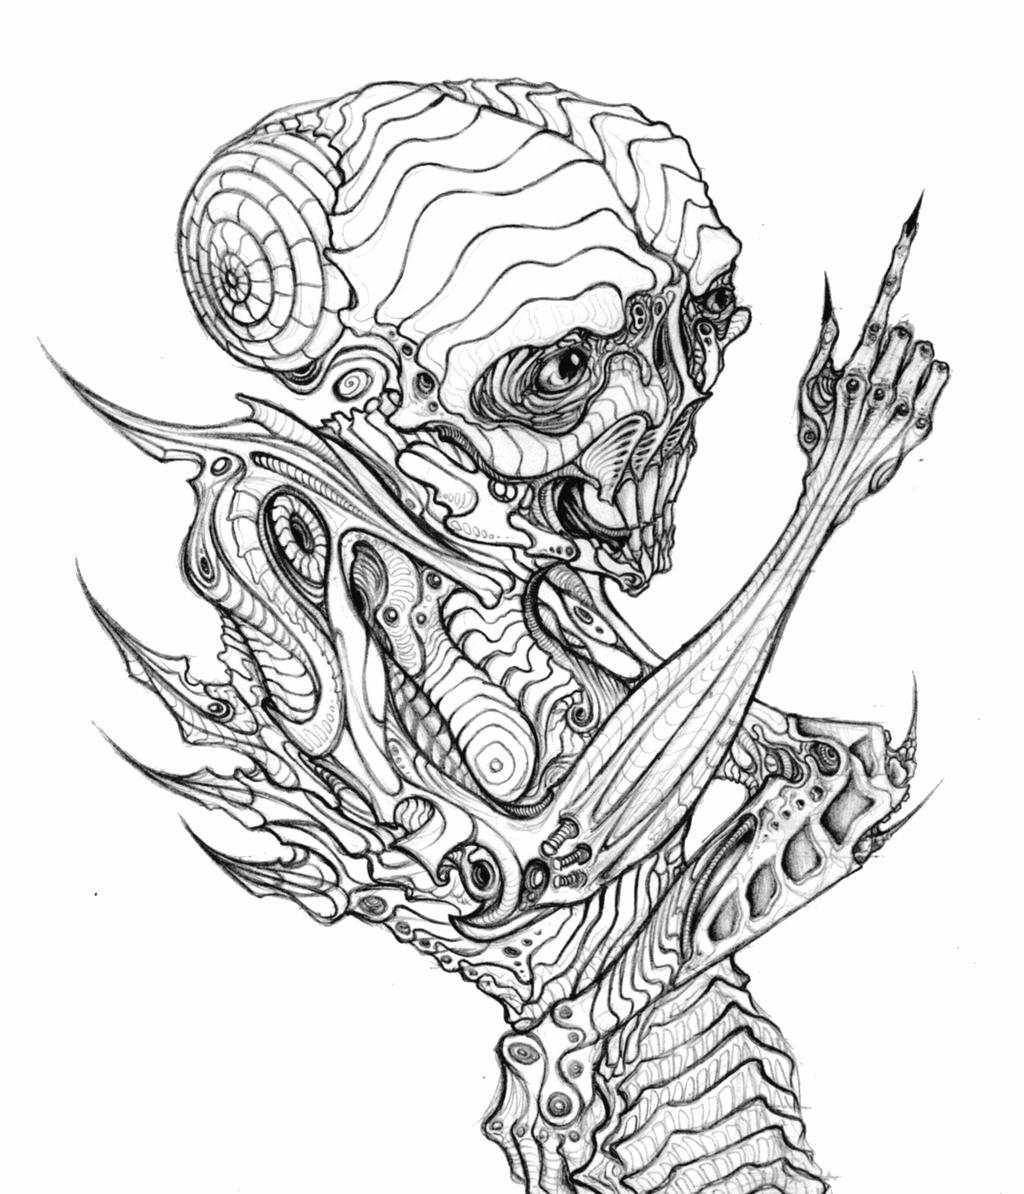 Finger by Pyreshard